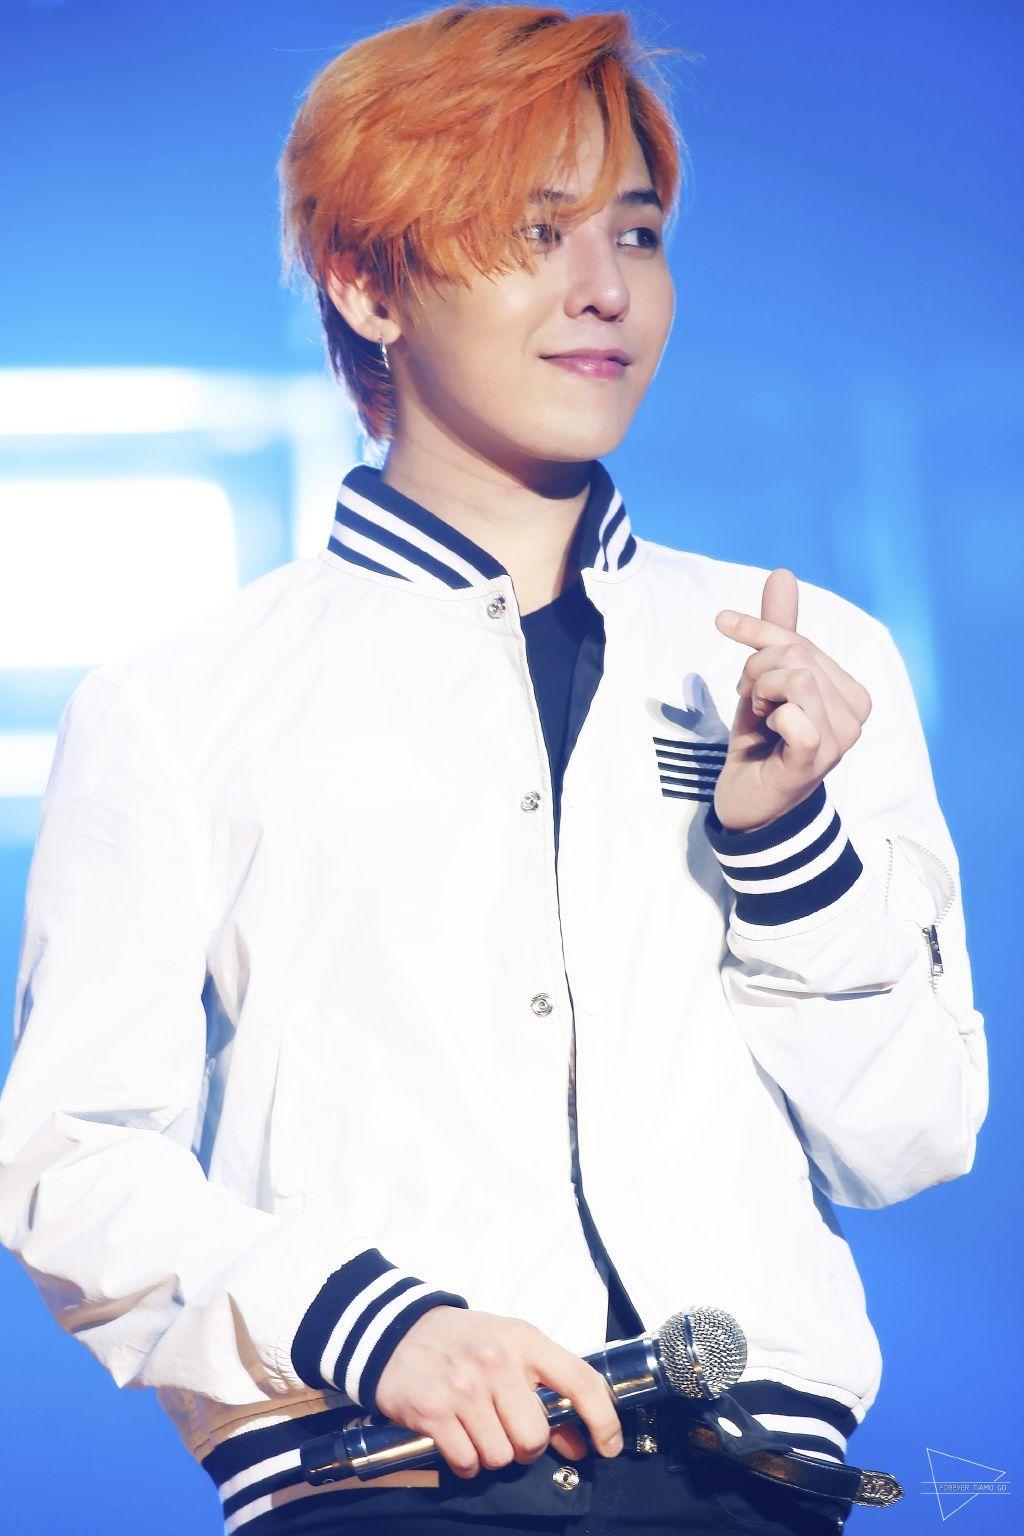 G Dragon Bigbang Fashion Nail Art Sticker Kpop Star Gift: G-Dragon - MADE Tour In Hangzhou